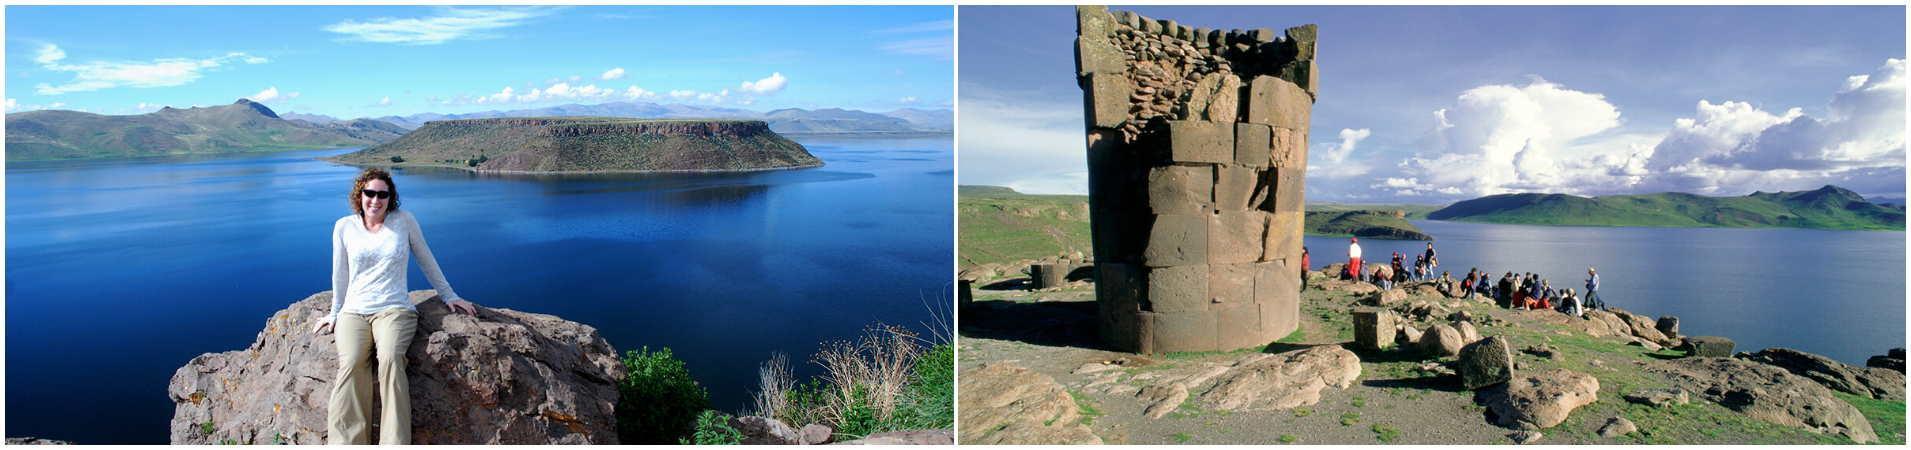 City Tours Puno 4 dias qori inka travel agency